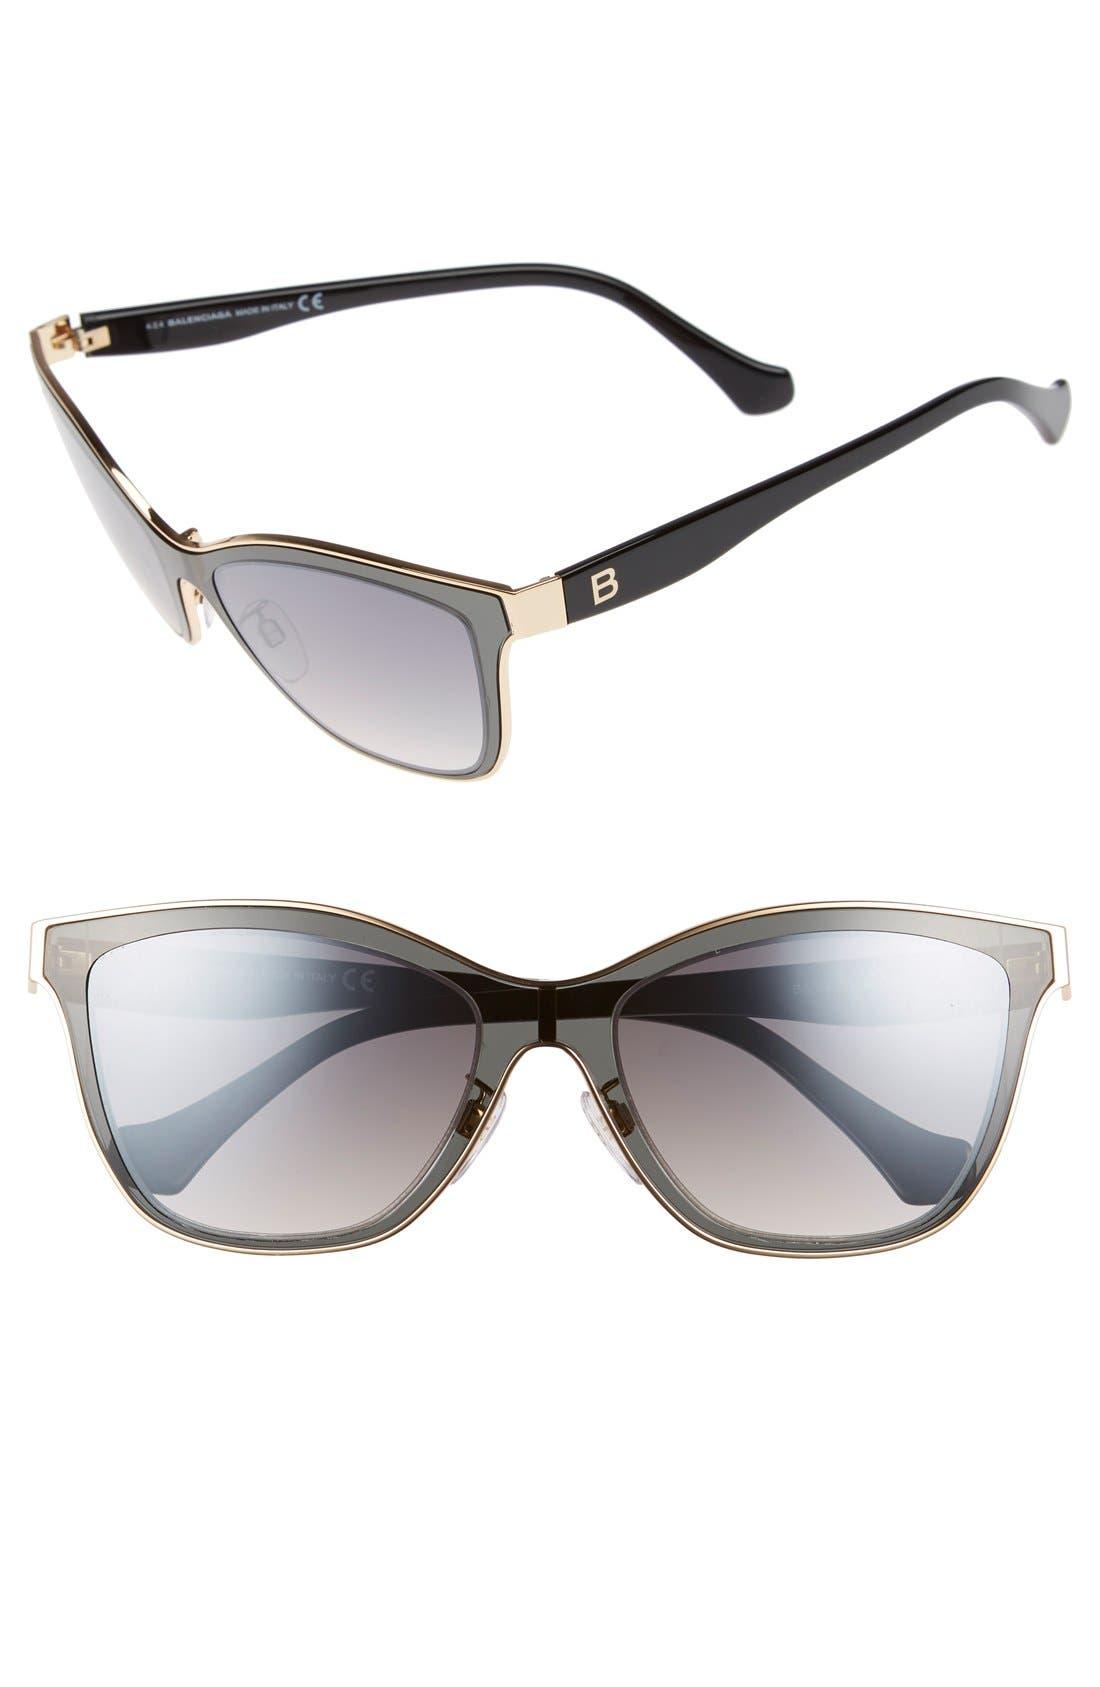 Paris 54mm Sunglasses,                         Main,                         color, Rose Gold/ Black/ Smoke